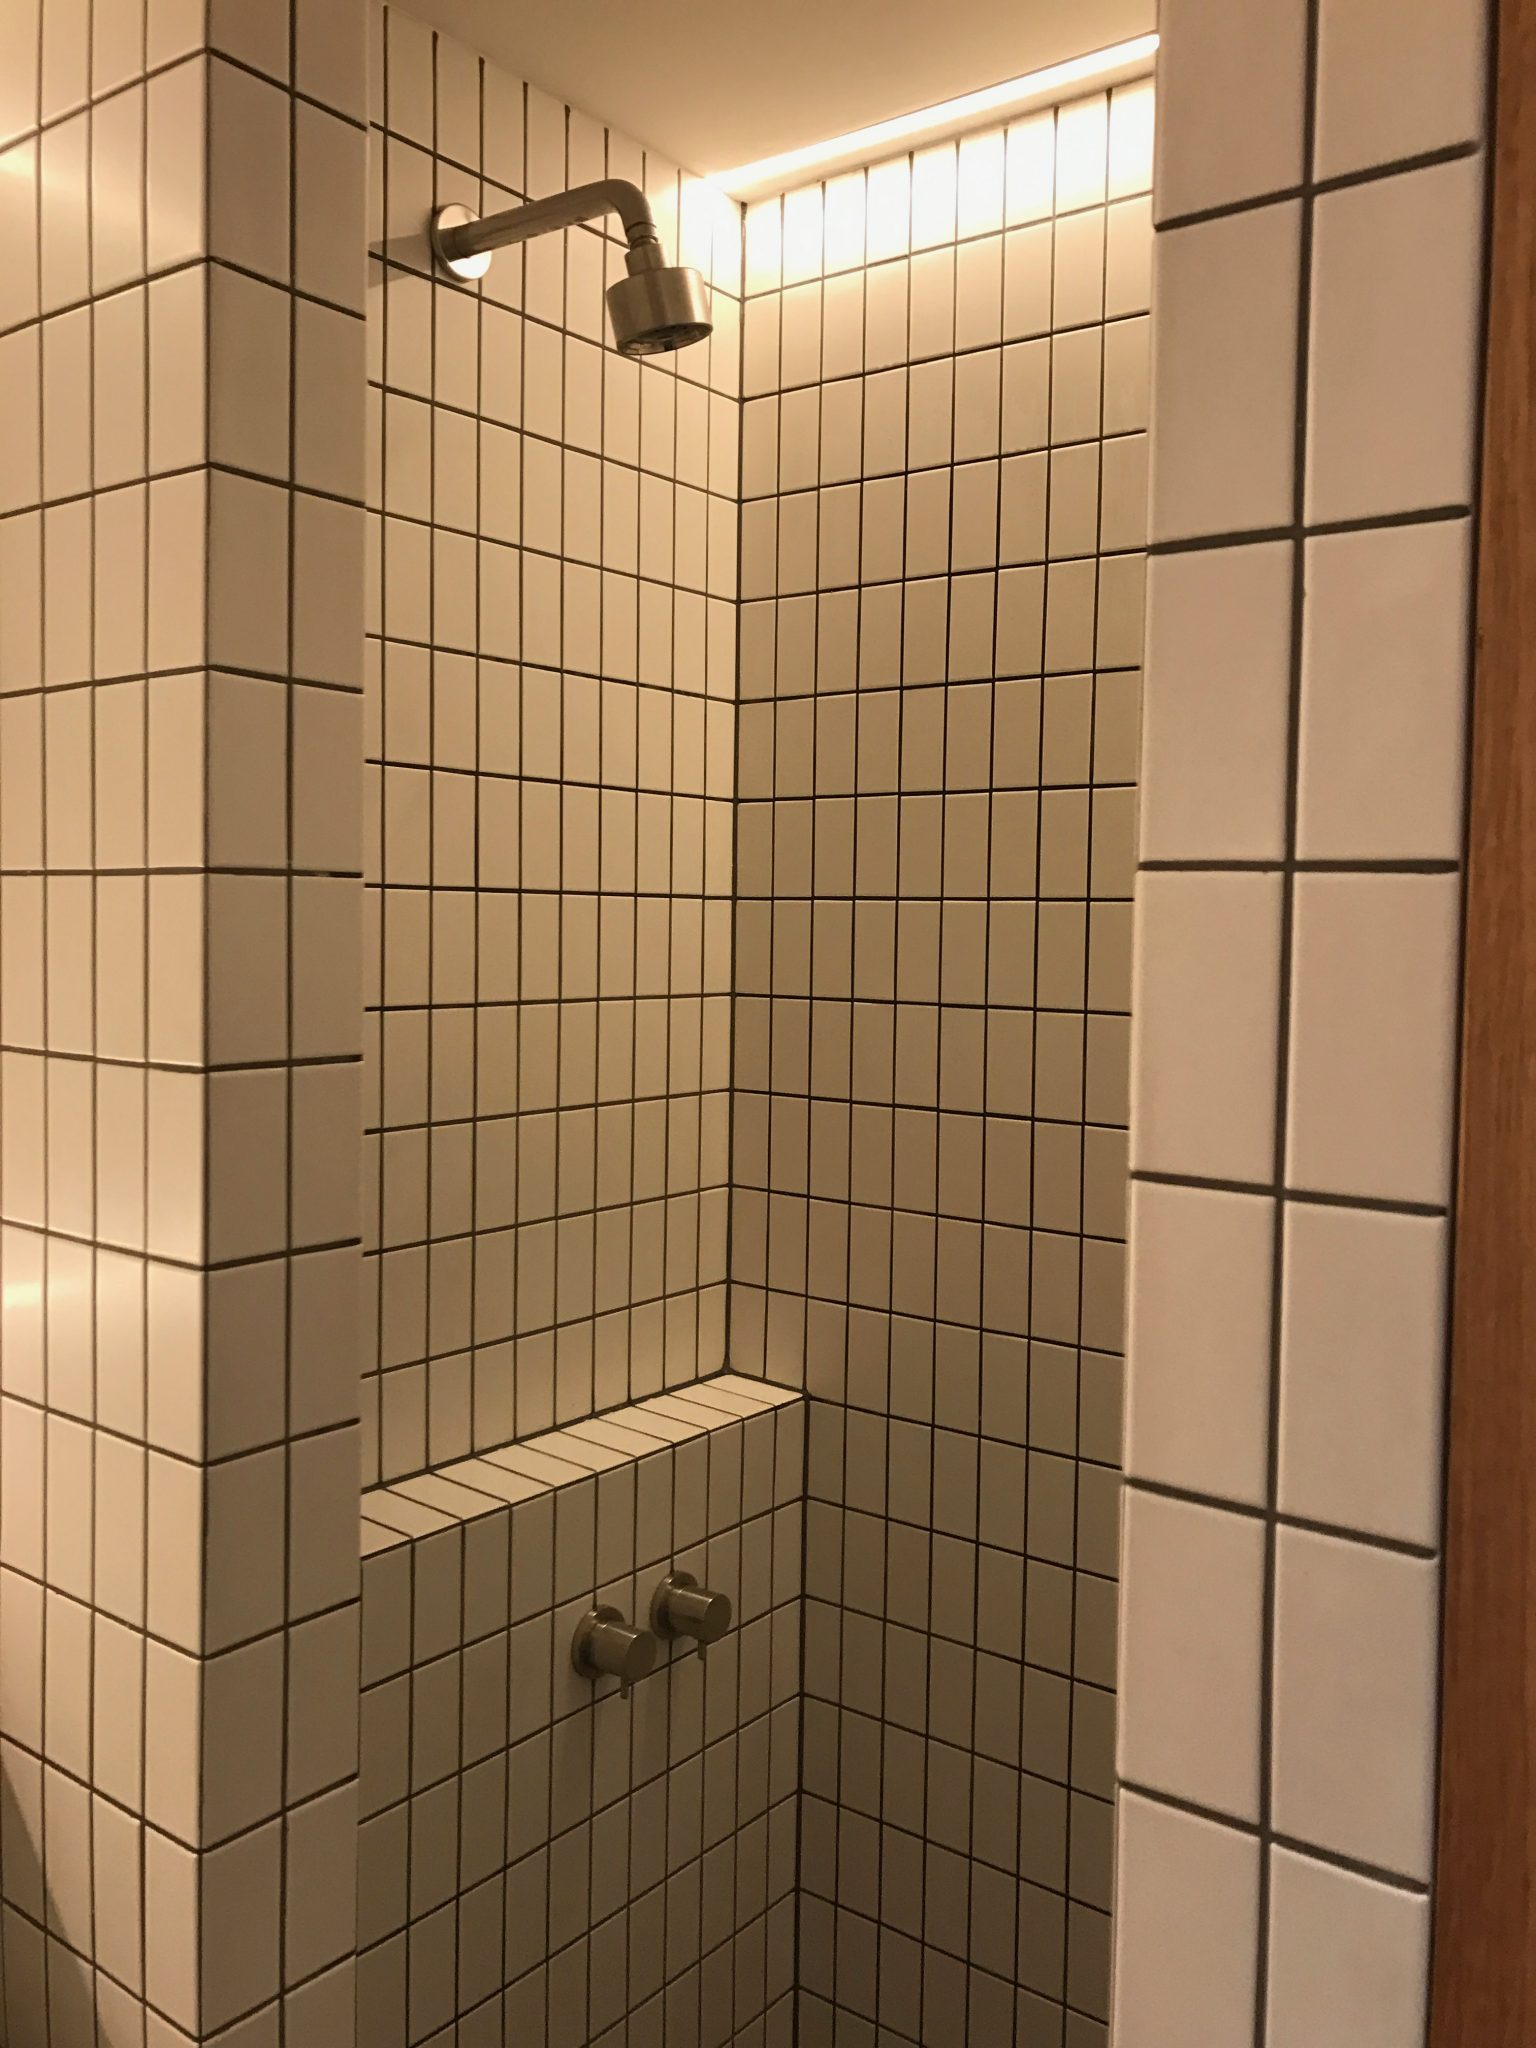 IMG 1786 - Tiling